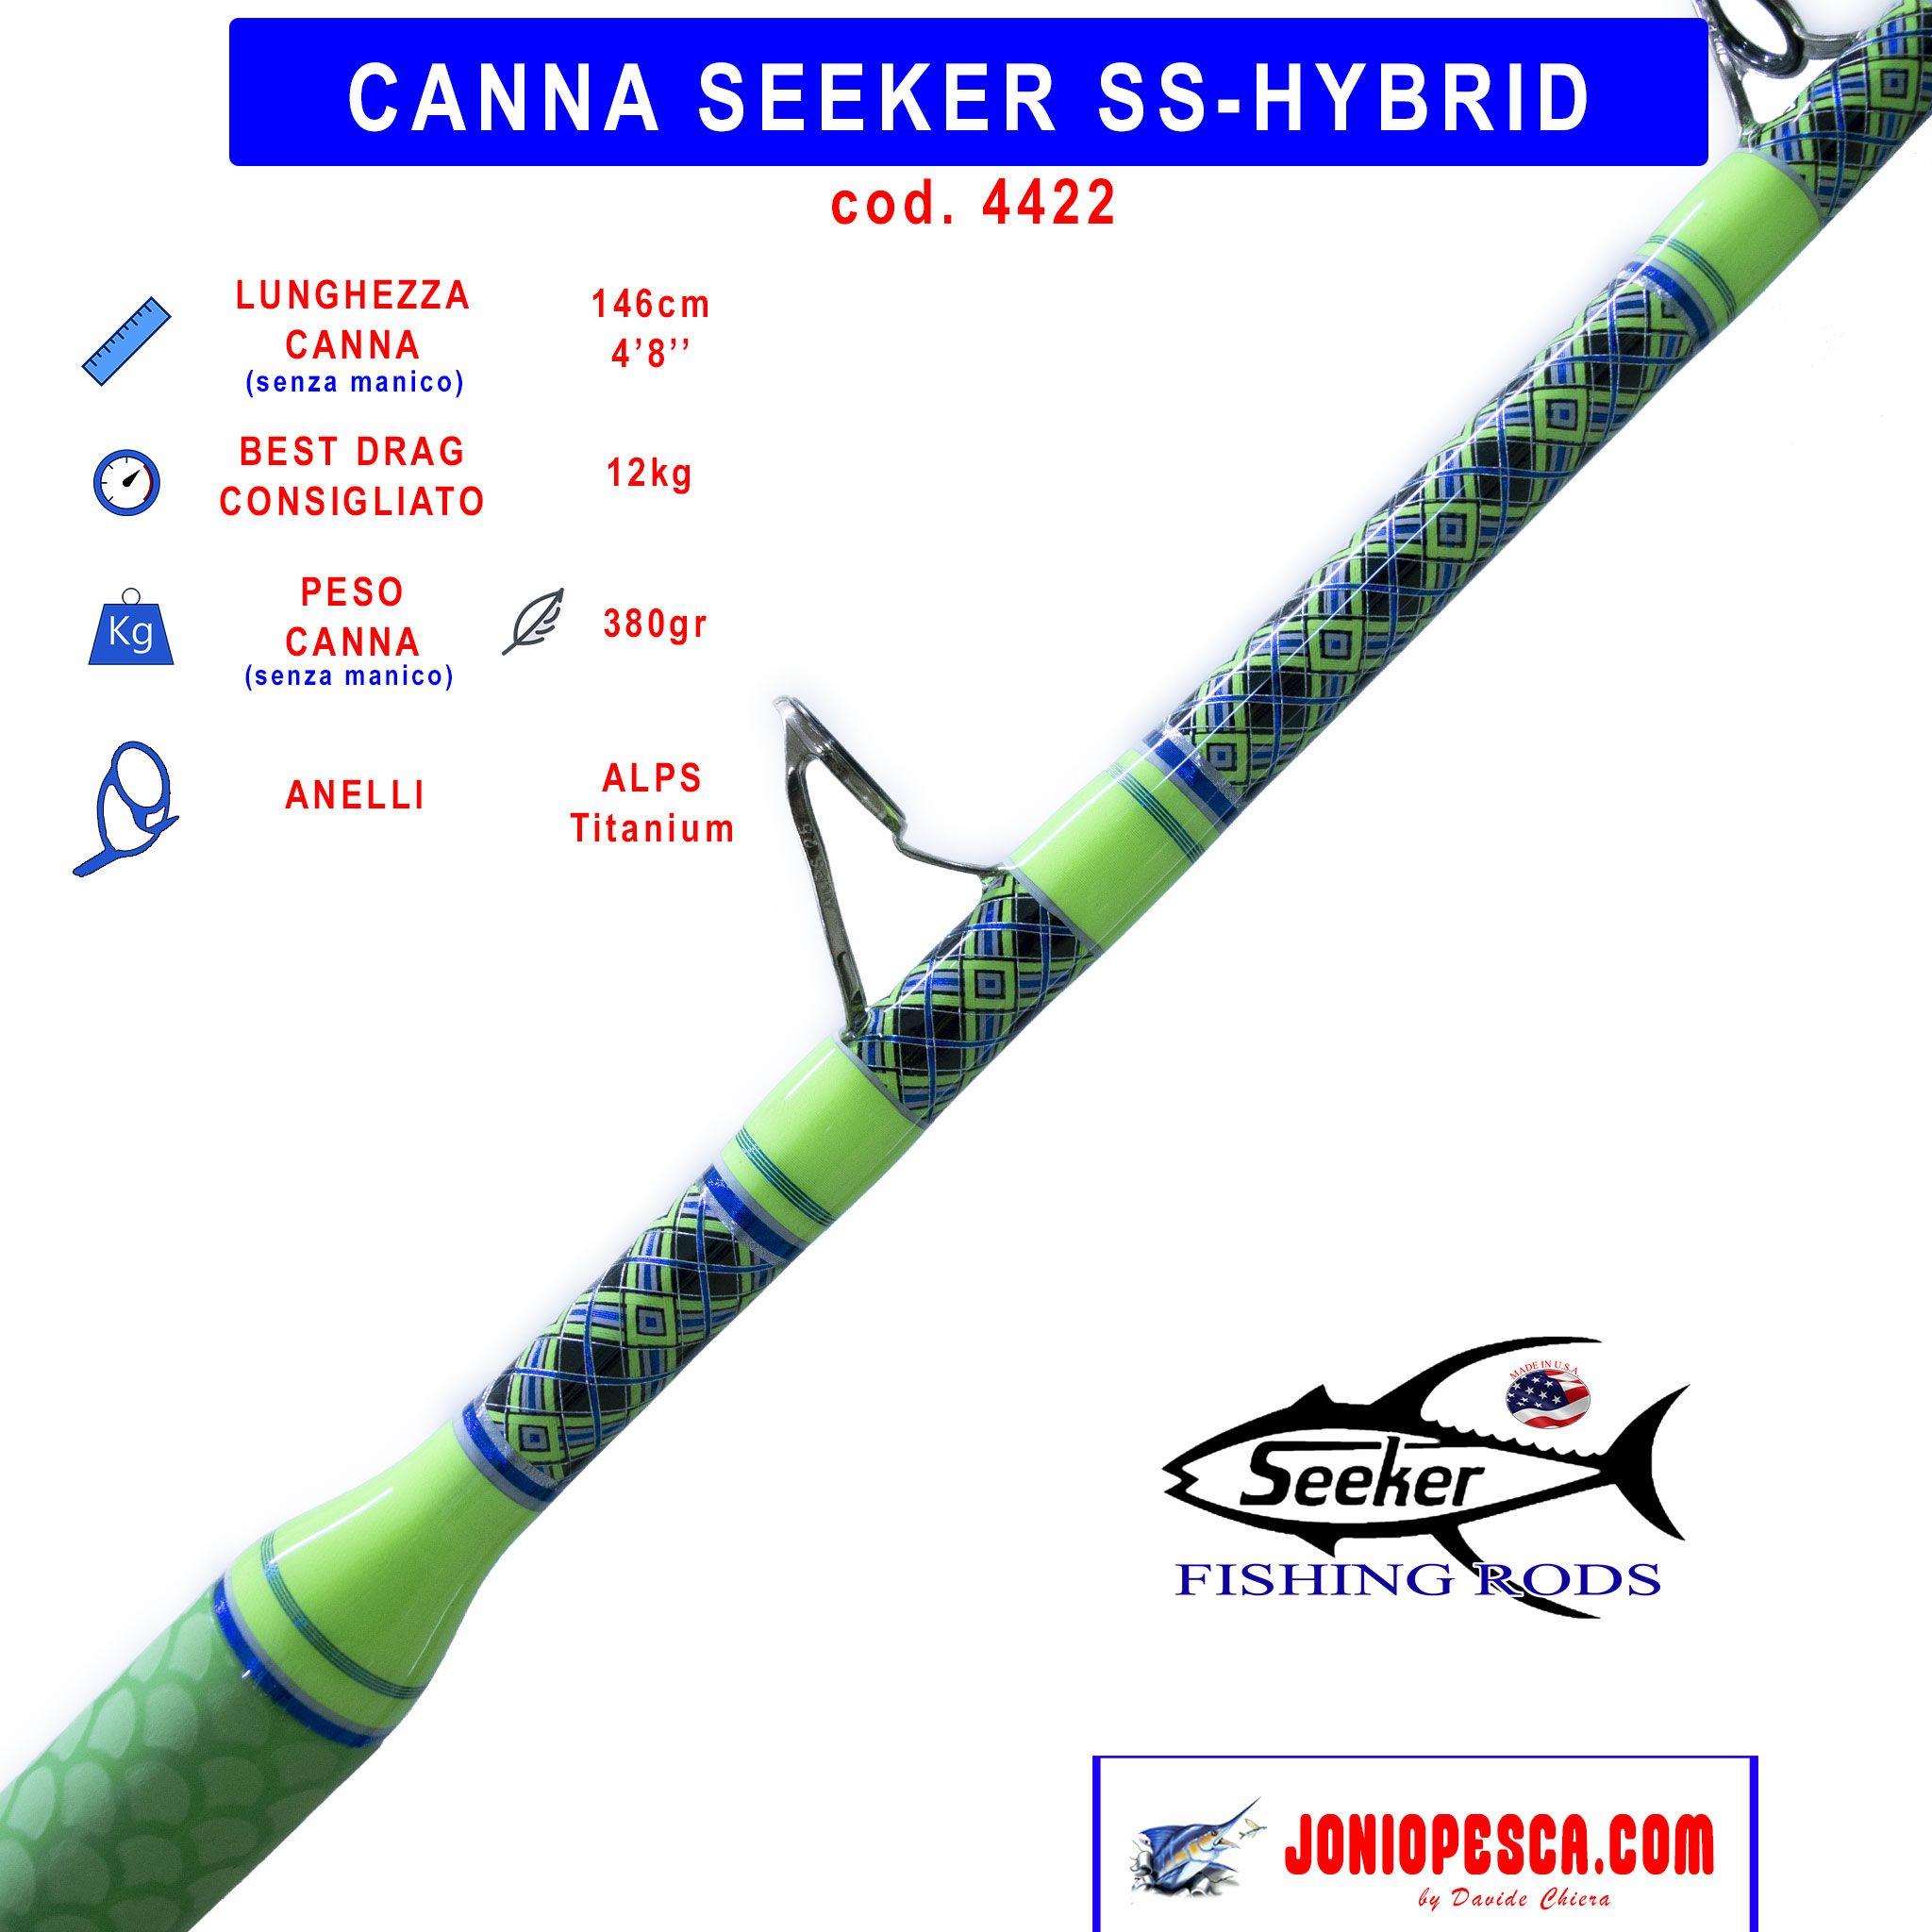 canna-seeker-ss-hybrid-4422-4